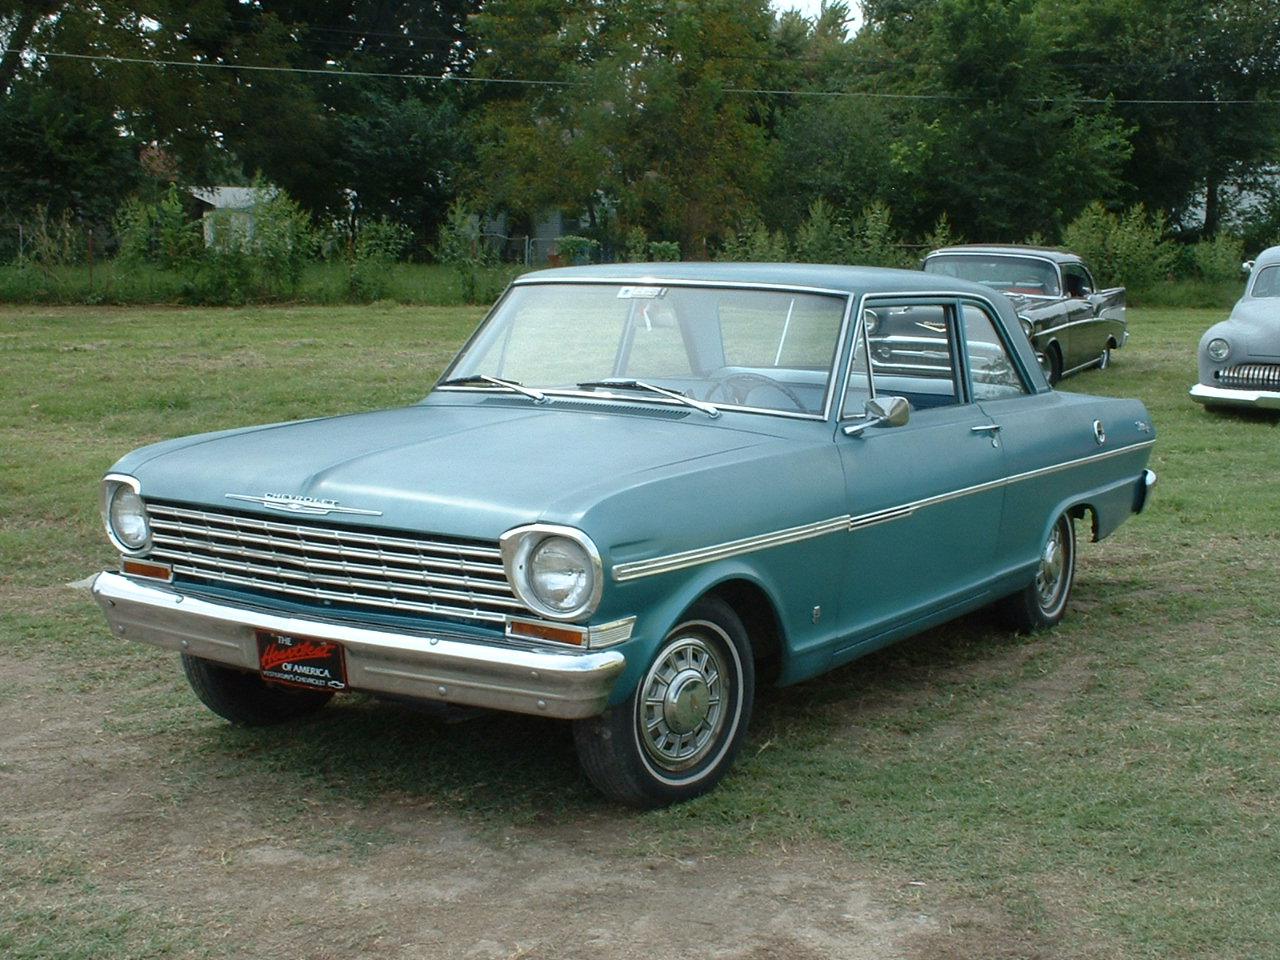 Car 5: 63 Chevy Nova II Sedan